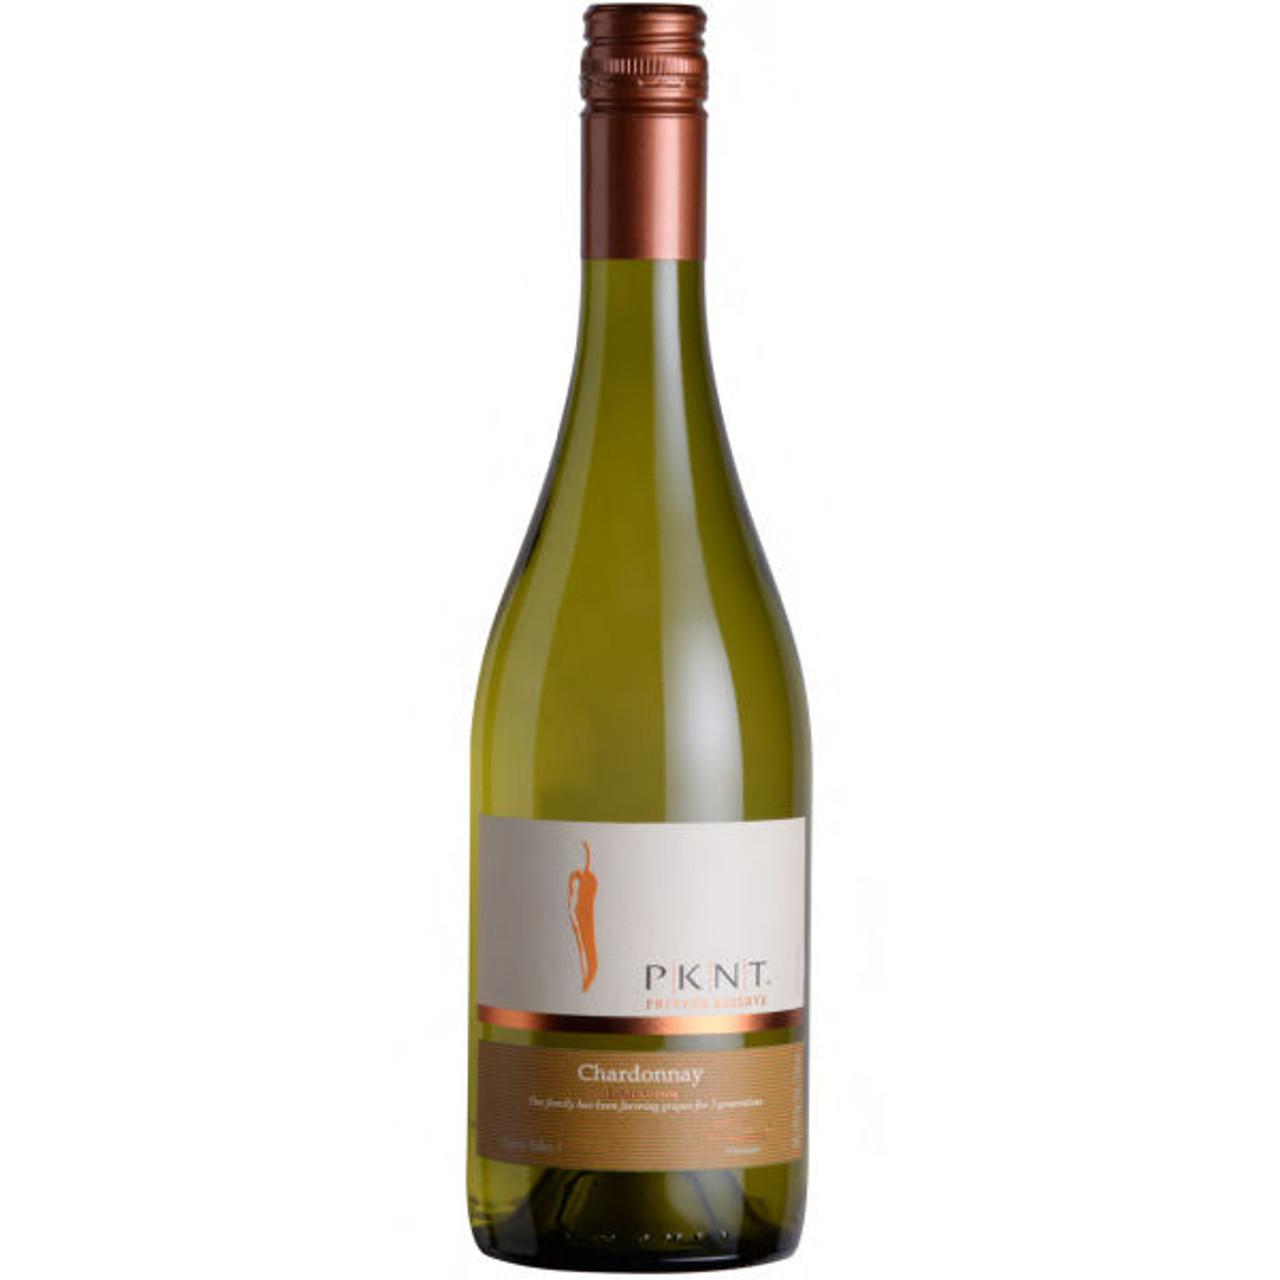 PKNT Private Reserve Chardonnay